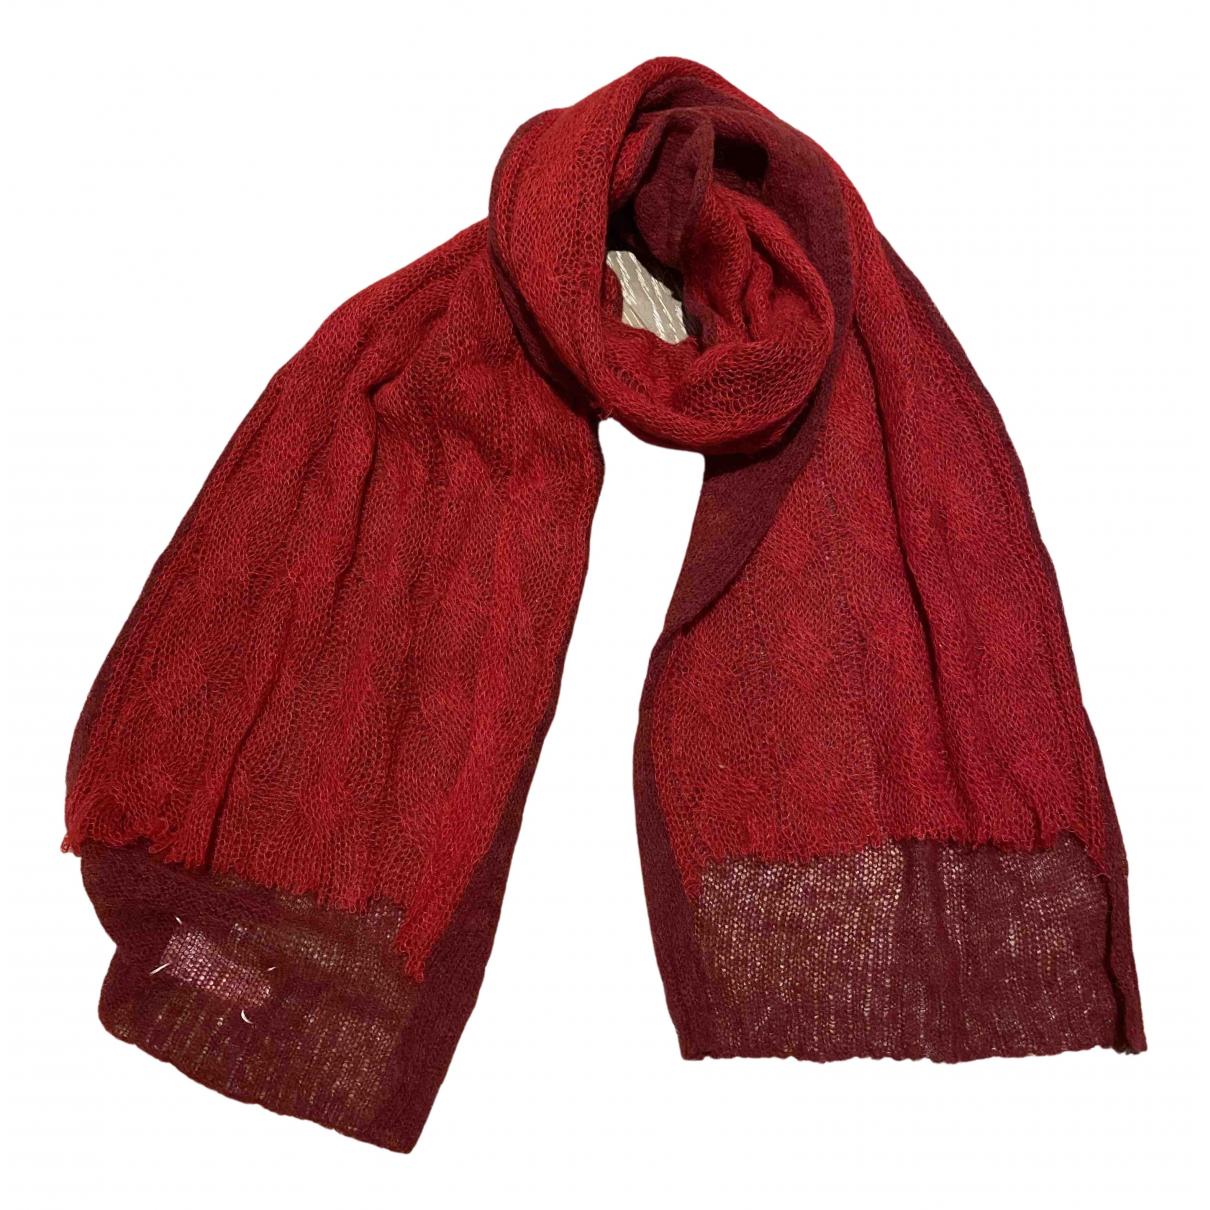 Maison Martin Margiela \N Schal in  Rot Wolle